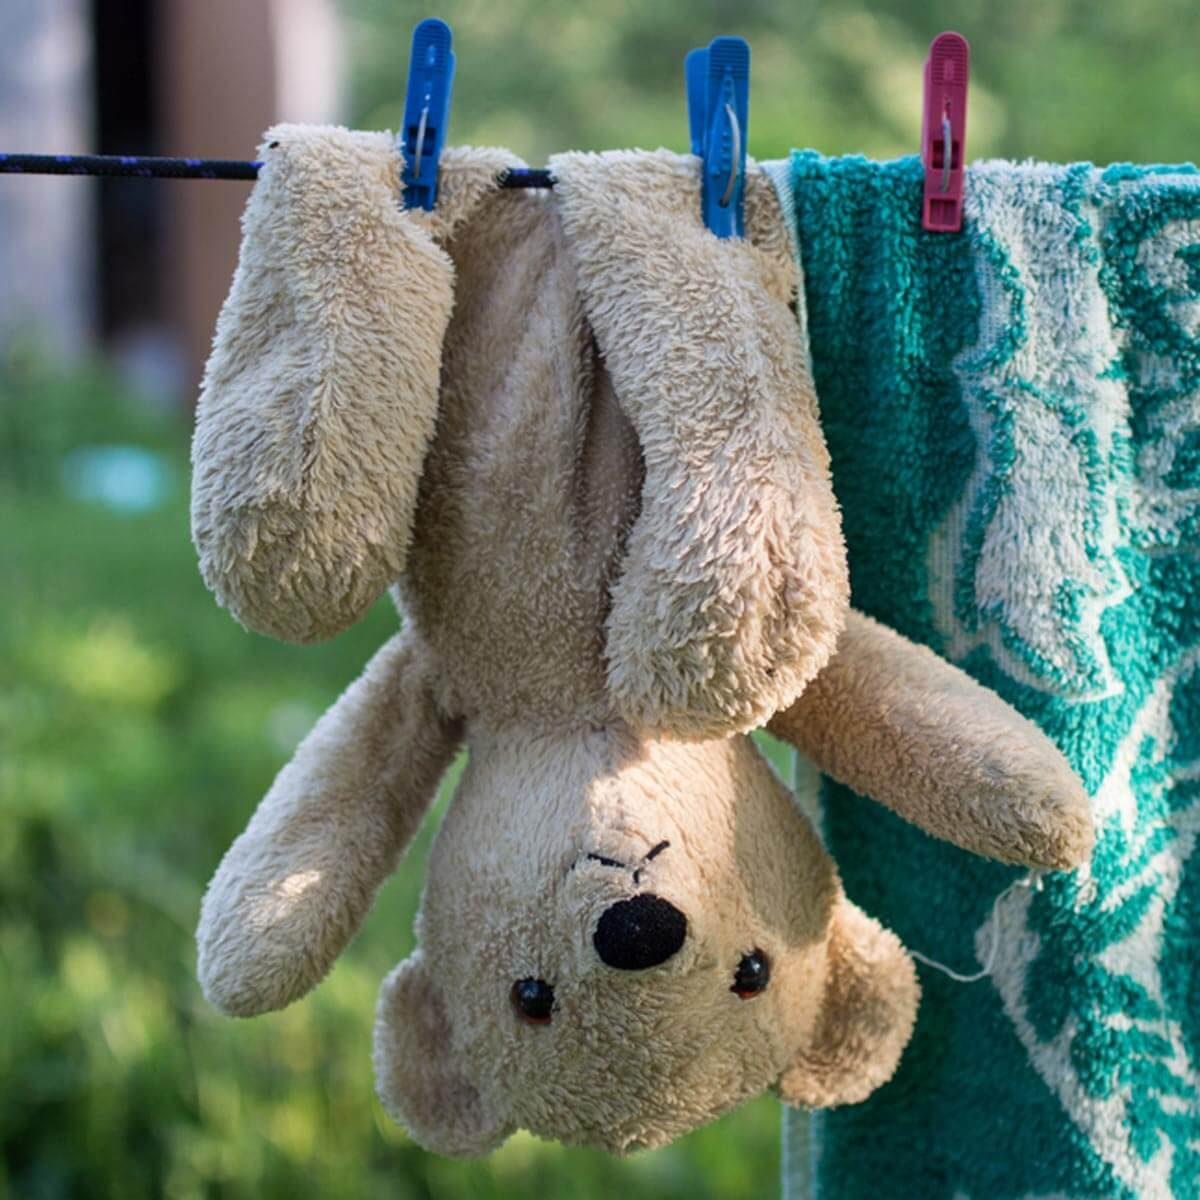 shutterstock_434304847 wash hang dry stuffed animal teddy bear